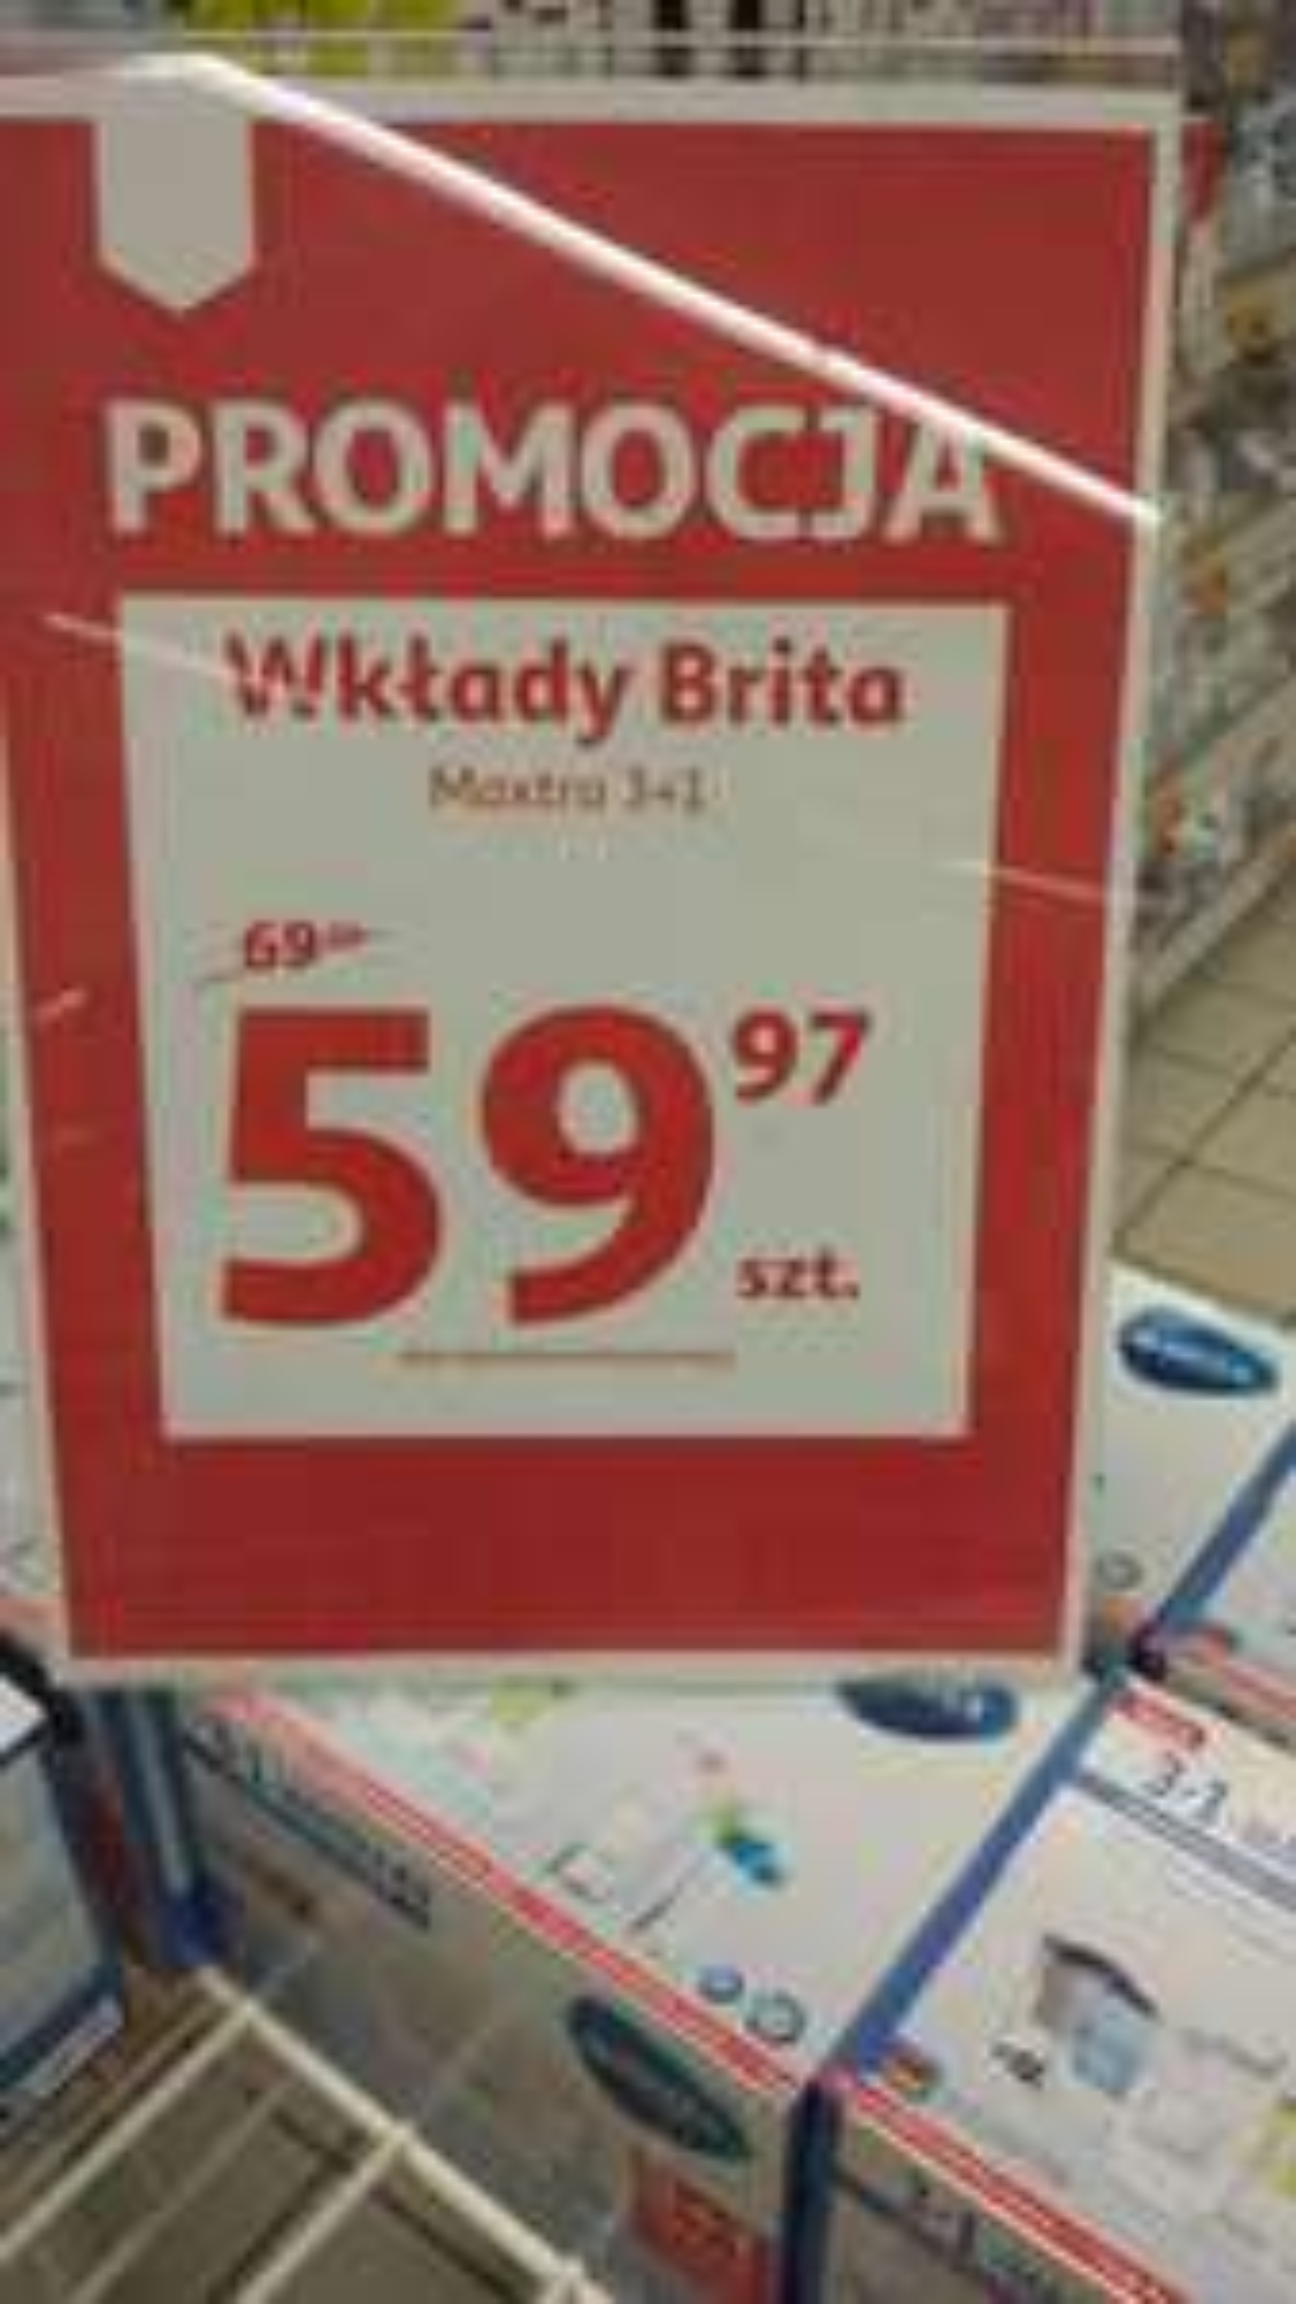 Wkłady Brita Maxtra + @ Auchan